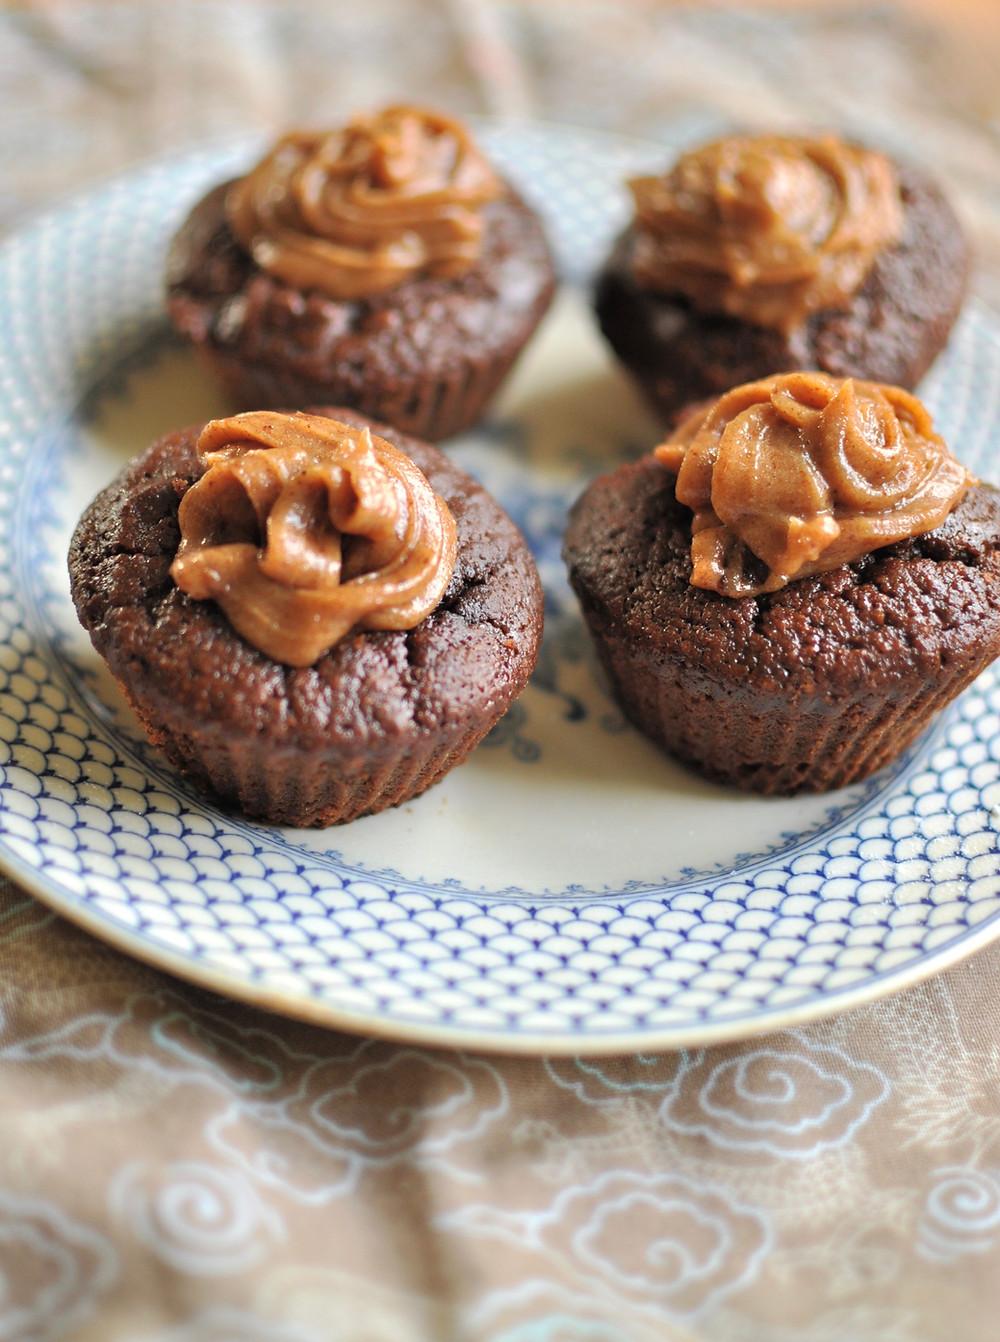 chocolate and caramel mini-cakes